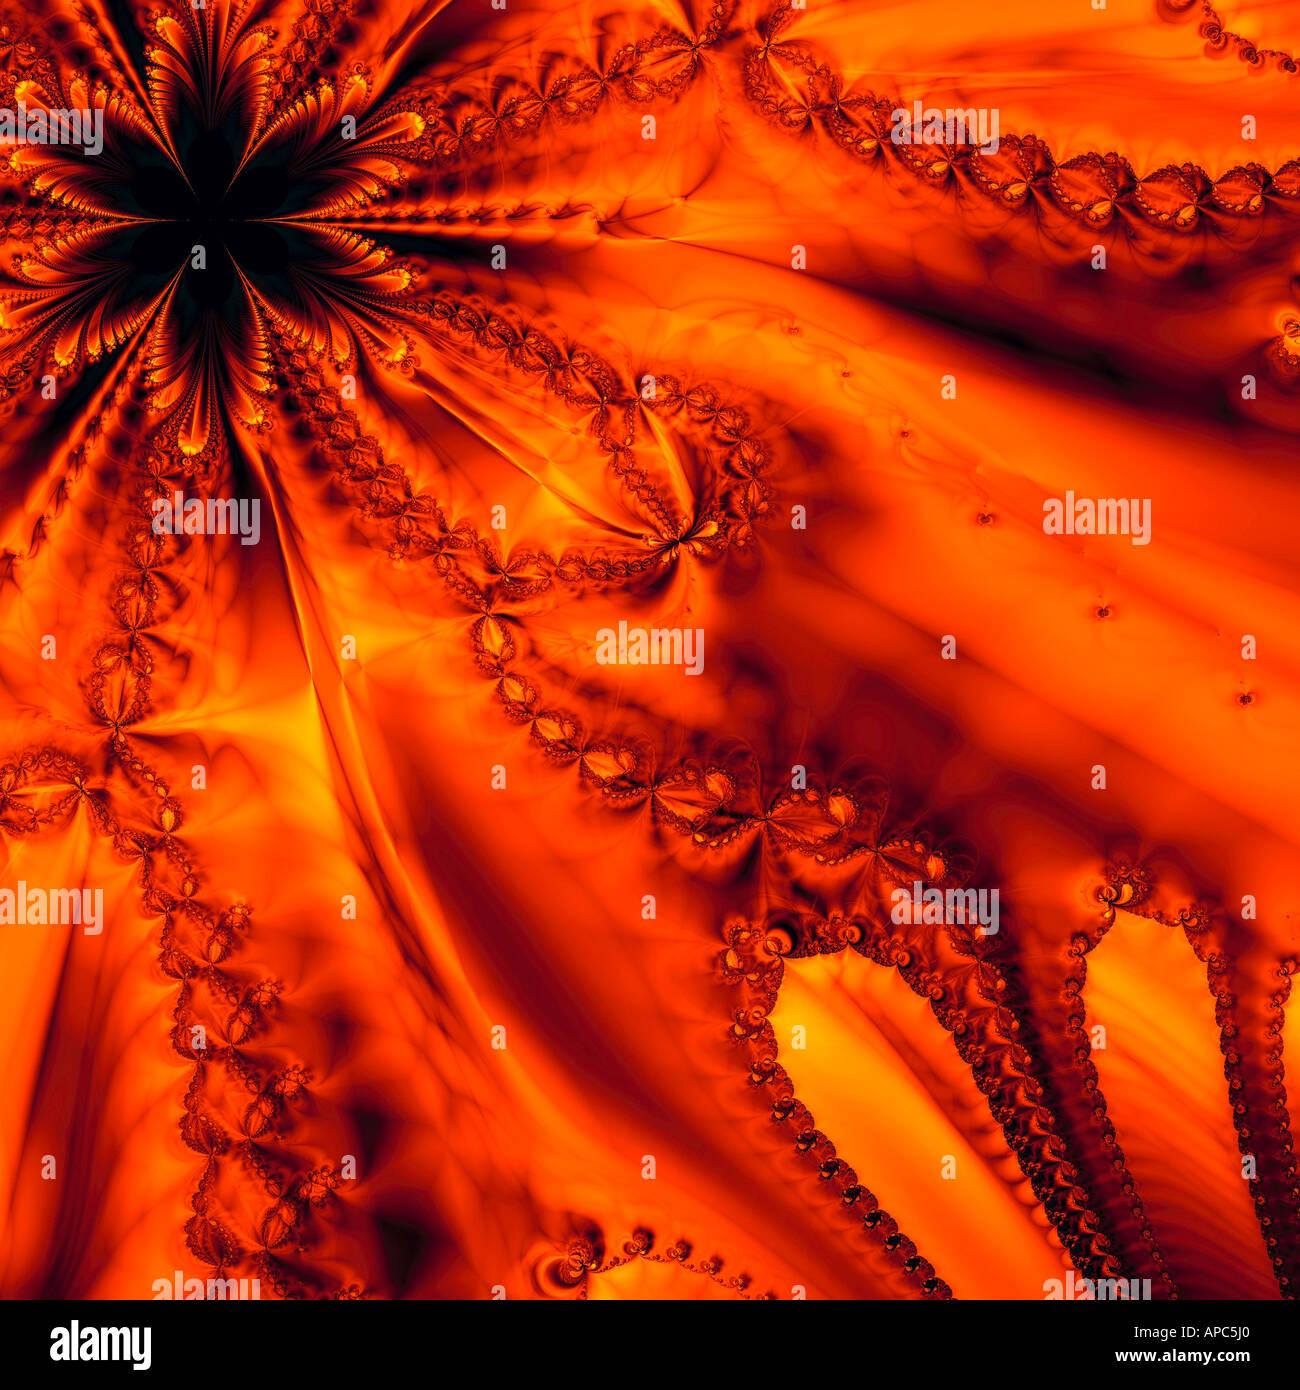 Fractal Image - Stock Image